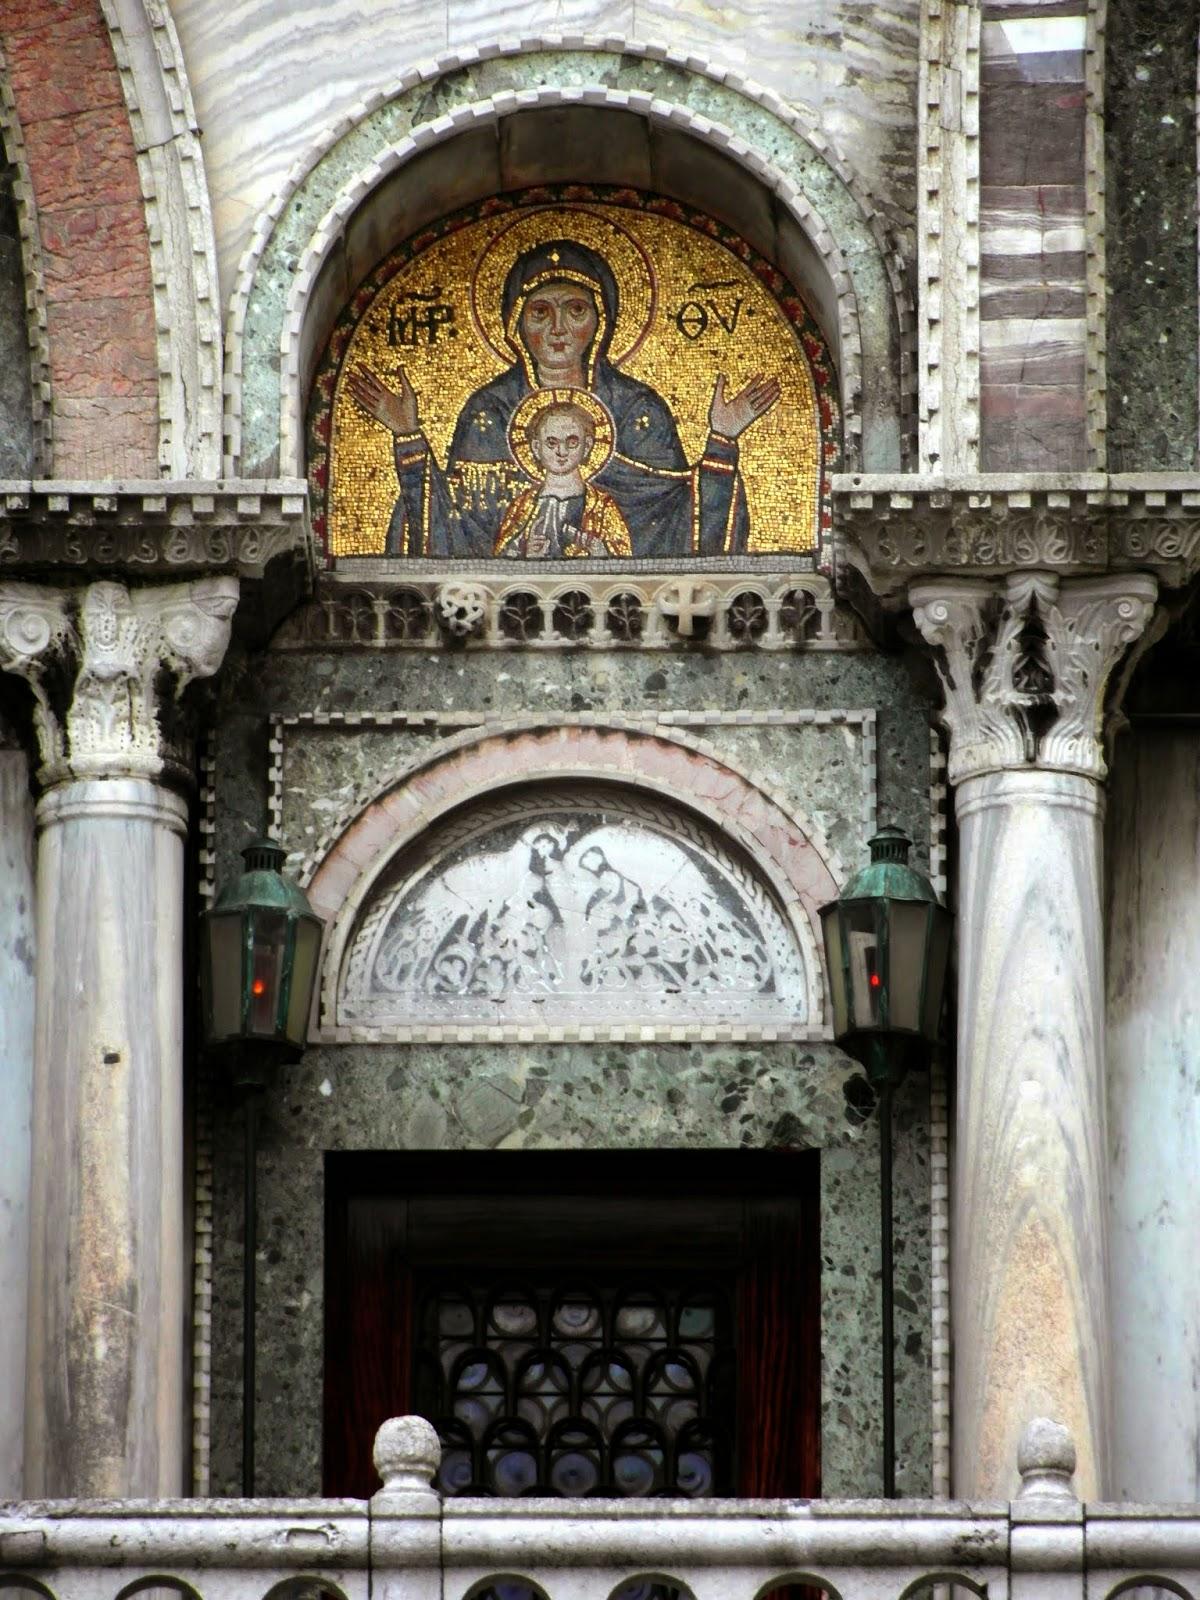 Two lamps, Basilica San Marco, Venice